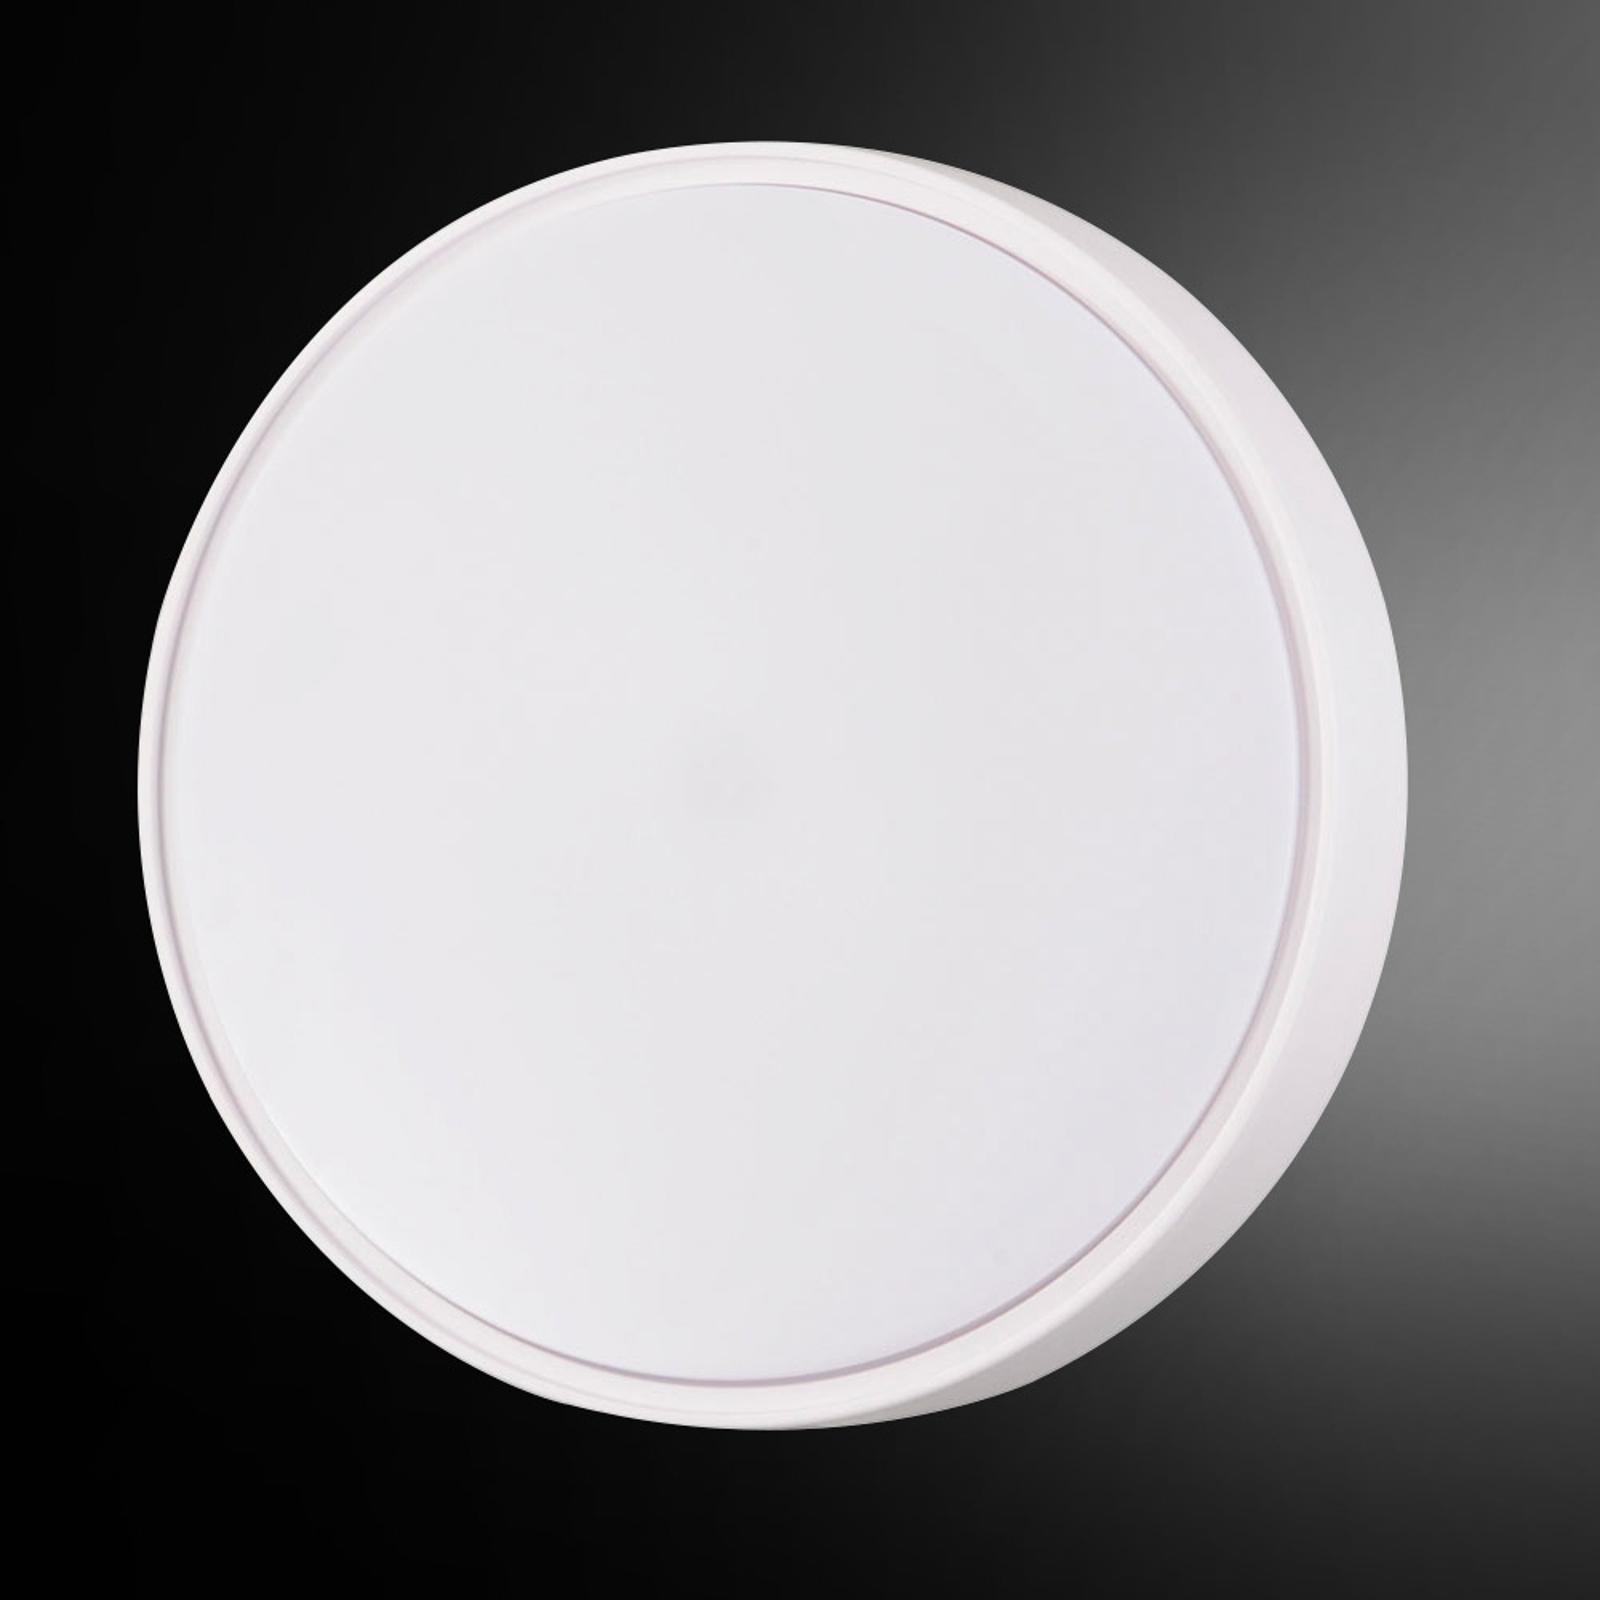 Hatton lys LED-væglampe, IP65, 30 cm